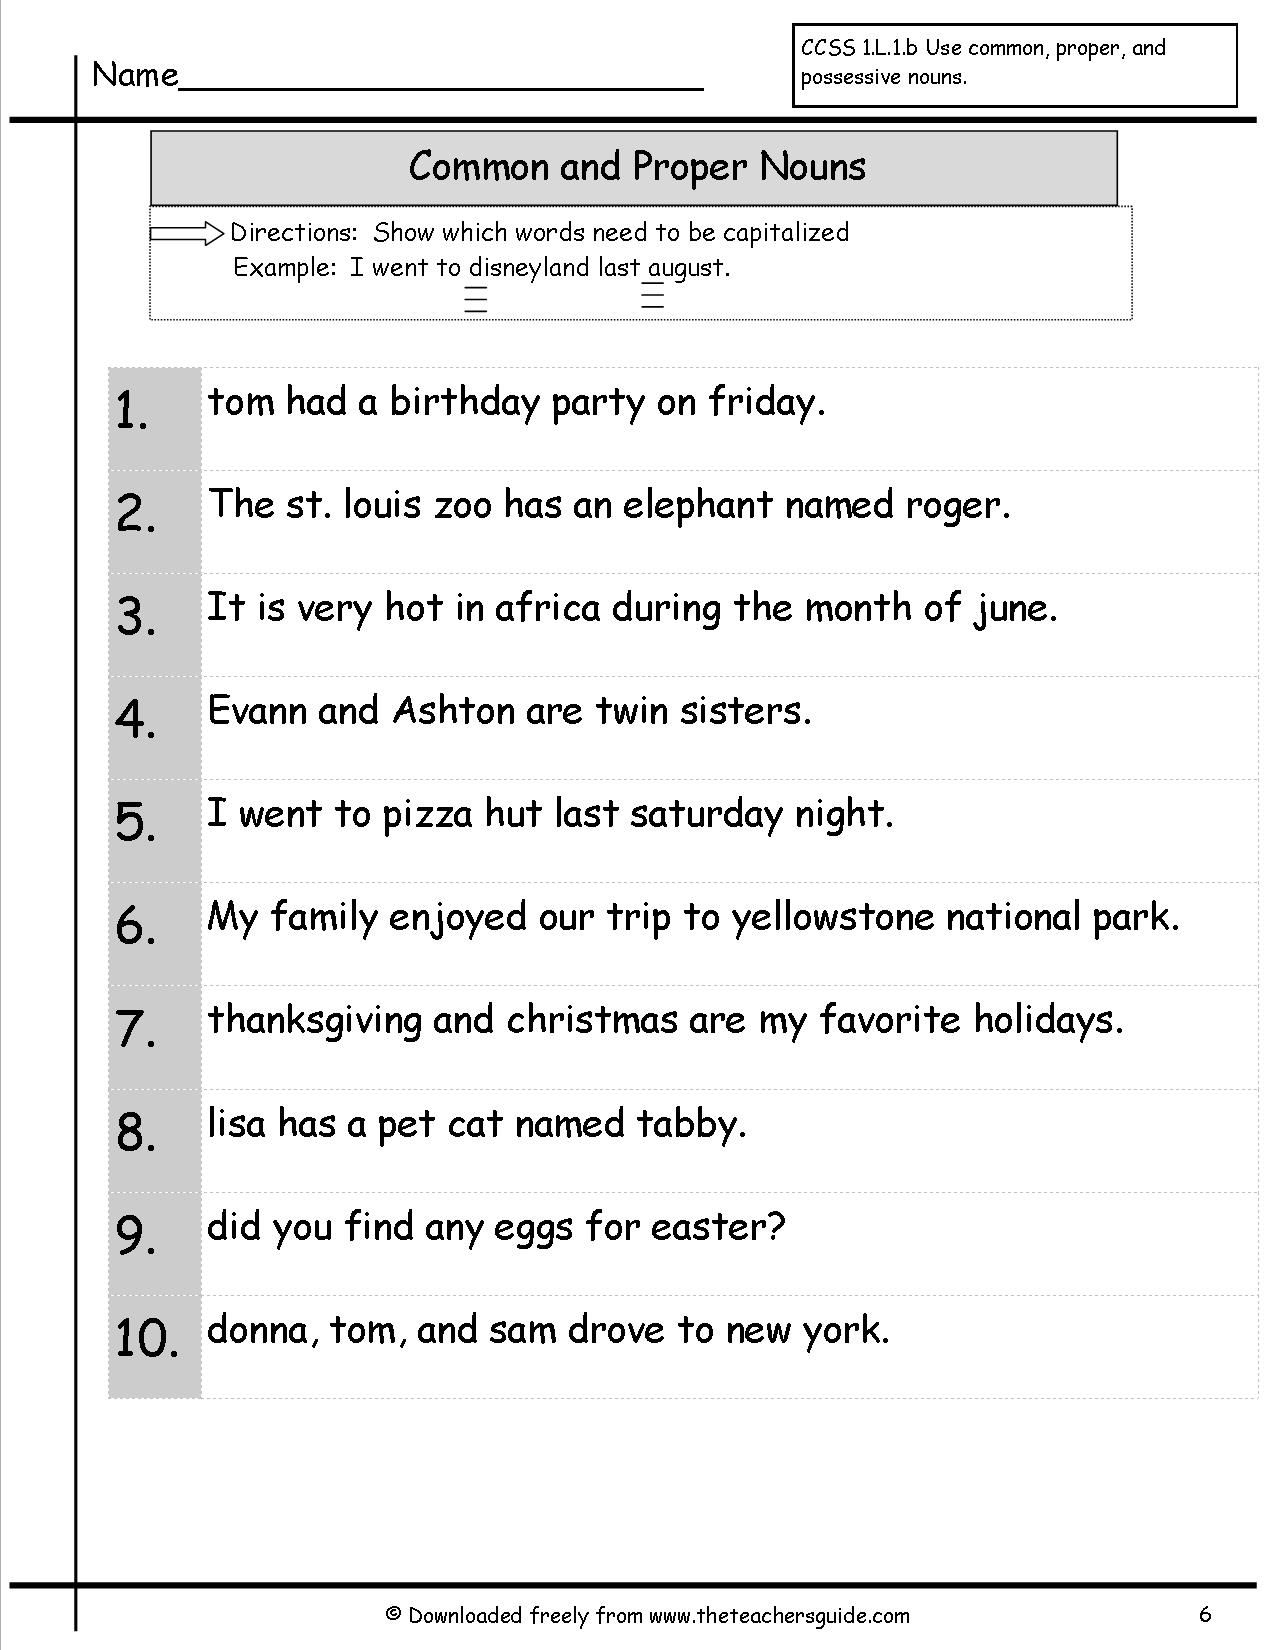 https://dubaikhalifas.com/nouns-common-nouns-proper-nouns-worksheets-for-grade-1-2-google-classroom/ [ 400 x 1650 Pixel ]